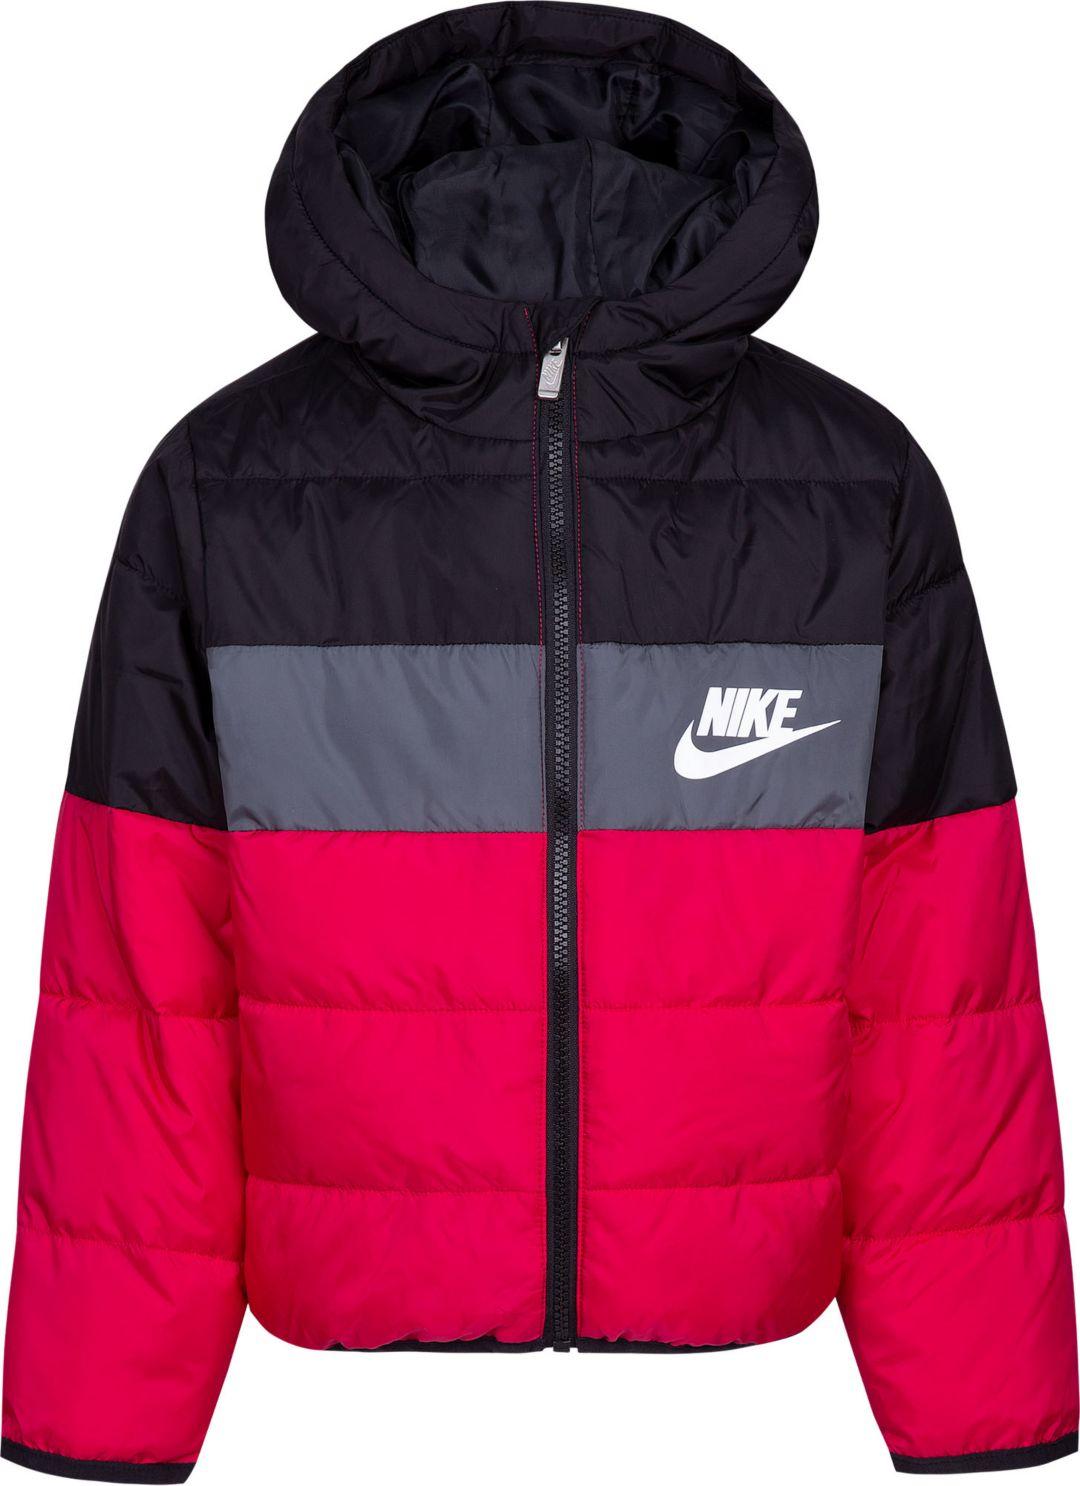 8c626671f Nike Girls' Polyfill Blocked Insulated Puffer Jacket